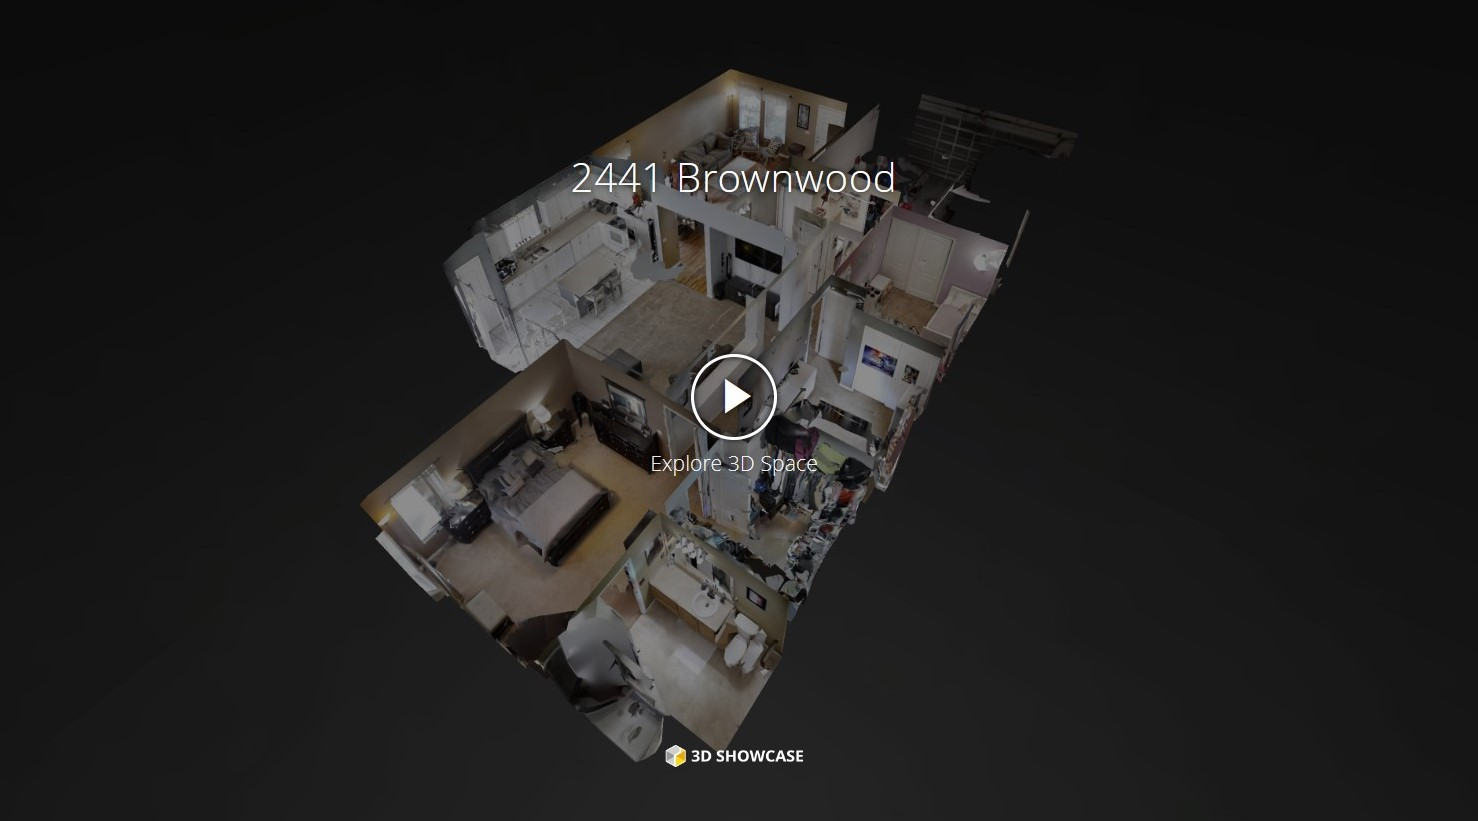 2441 brownwood -